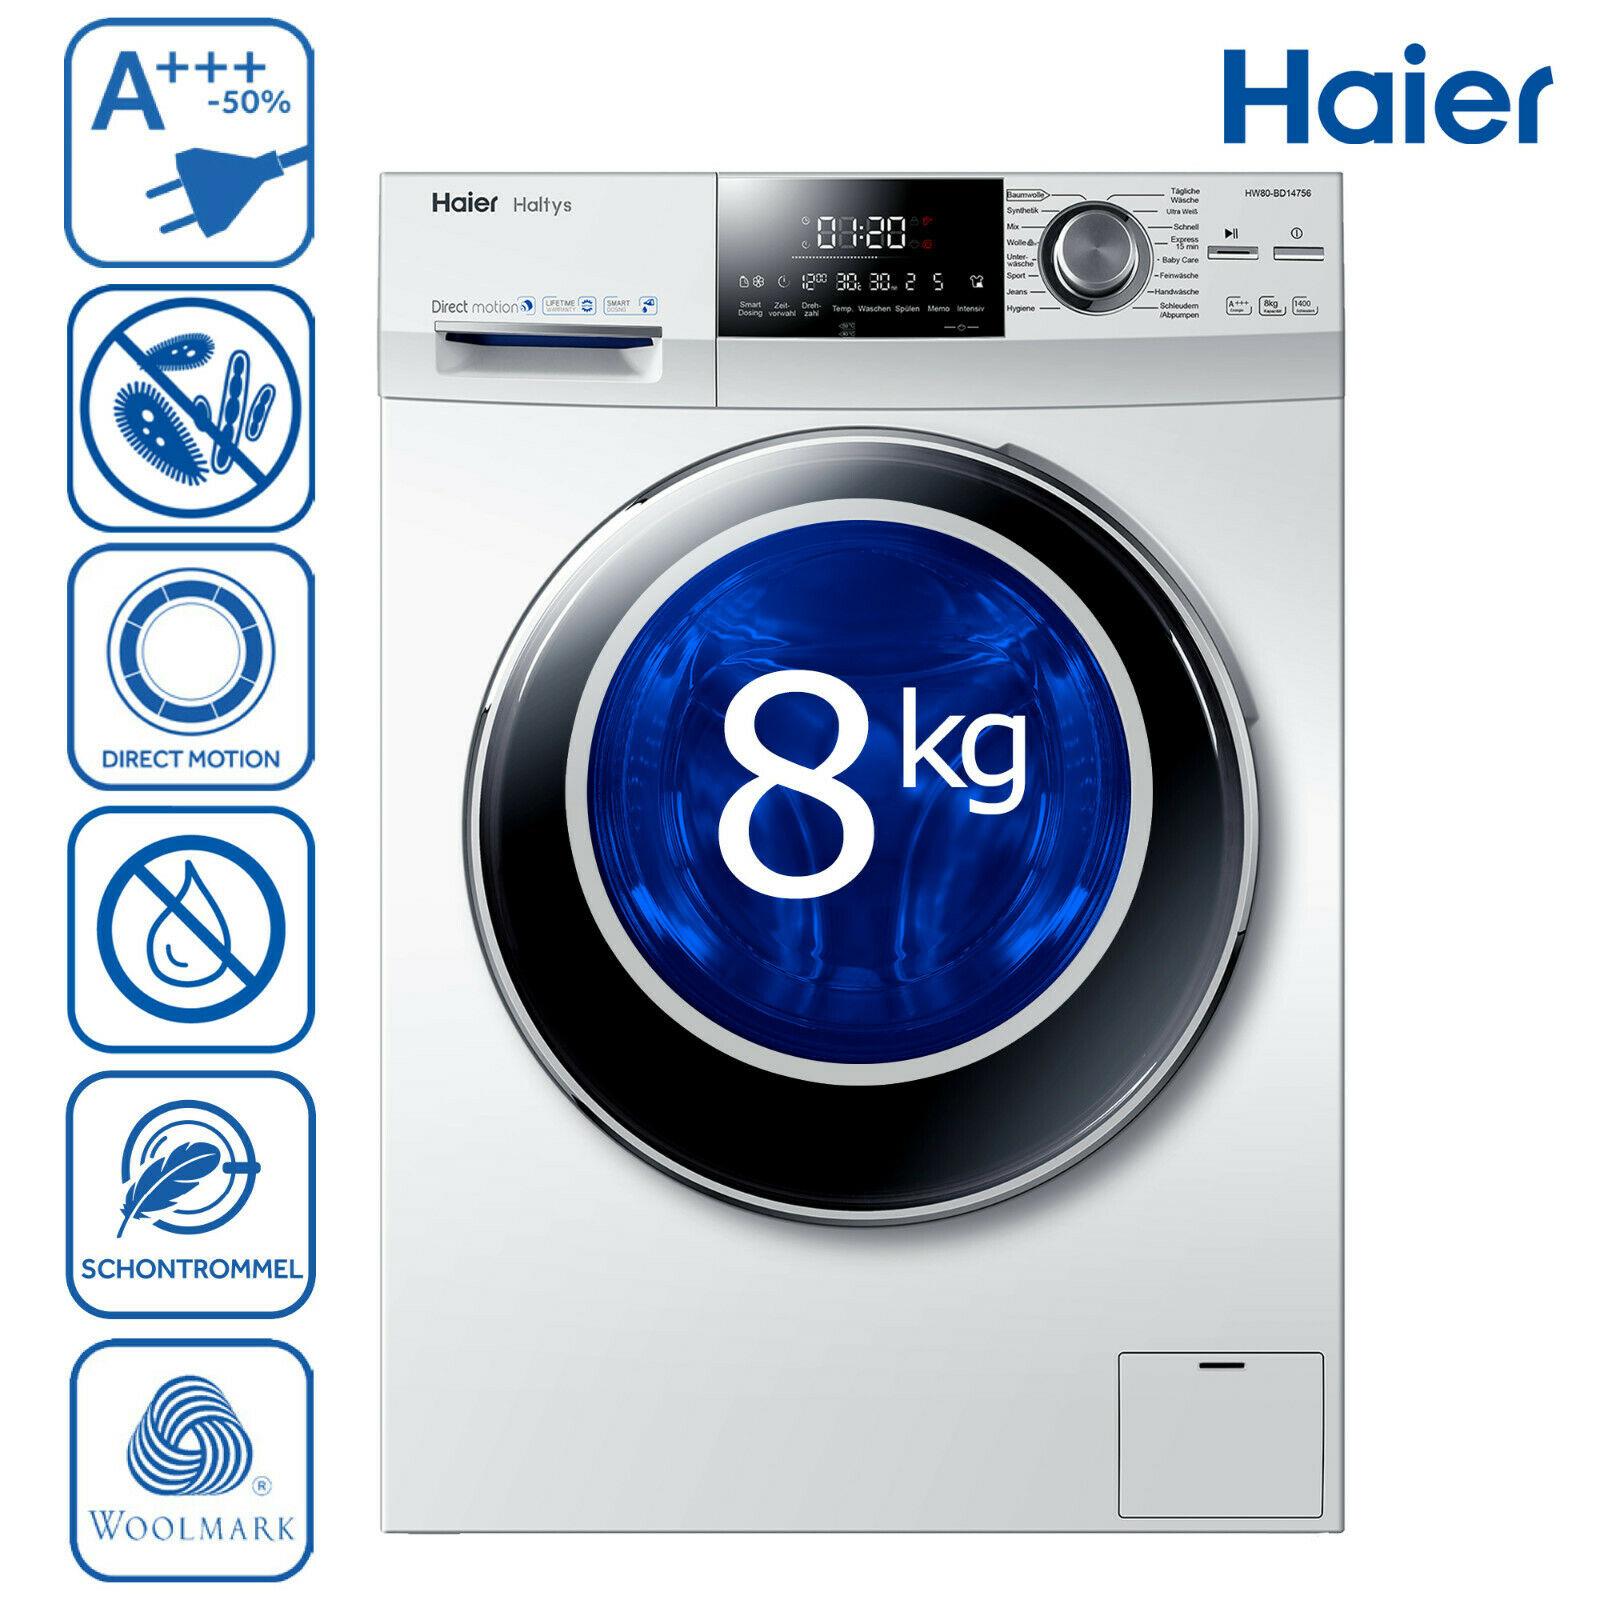 Haier HW80-BD14756 Waschmaschine Frontlader A+++ -50%